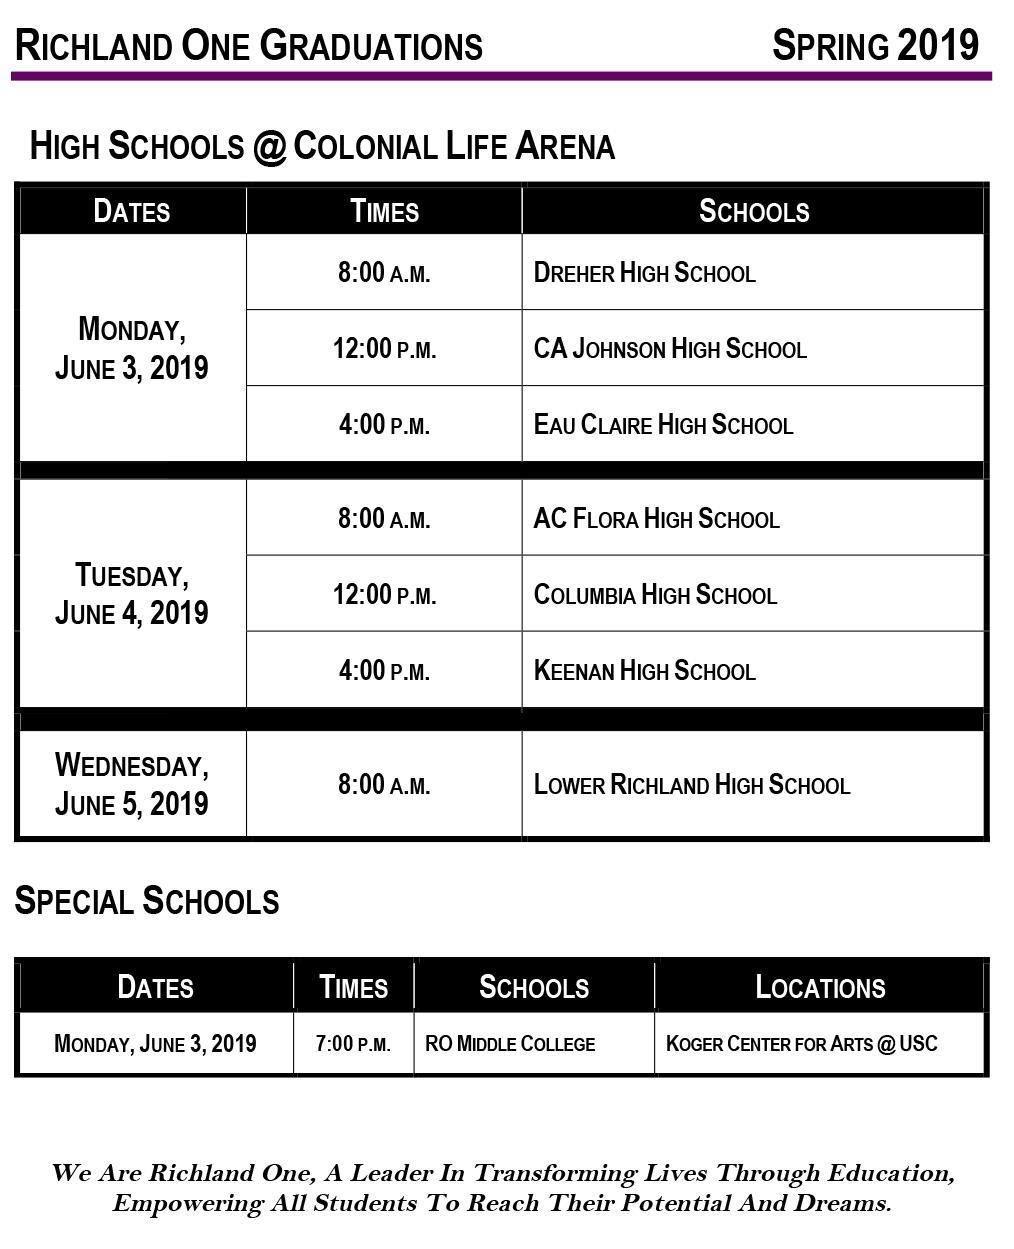 Cms 2014-2019 Calendar 2019 Richland One High School Graduation Schedule / Home